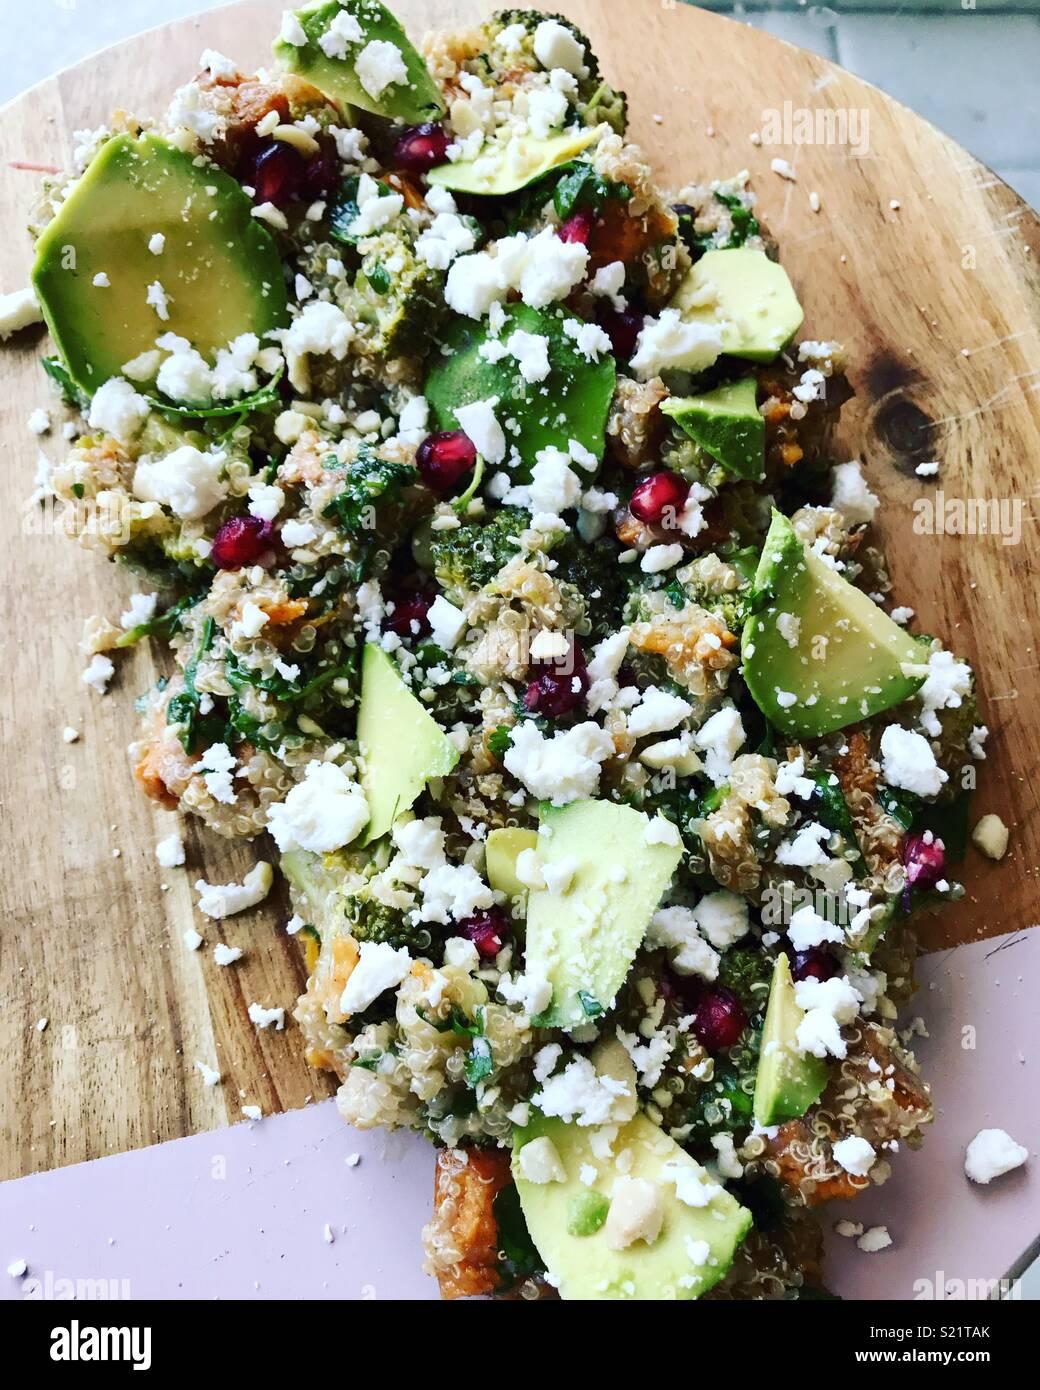 Quinoa Salad Feta Pomegranate Avocado High Resolution Stock Photography And Images Alamy